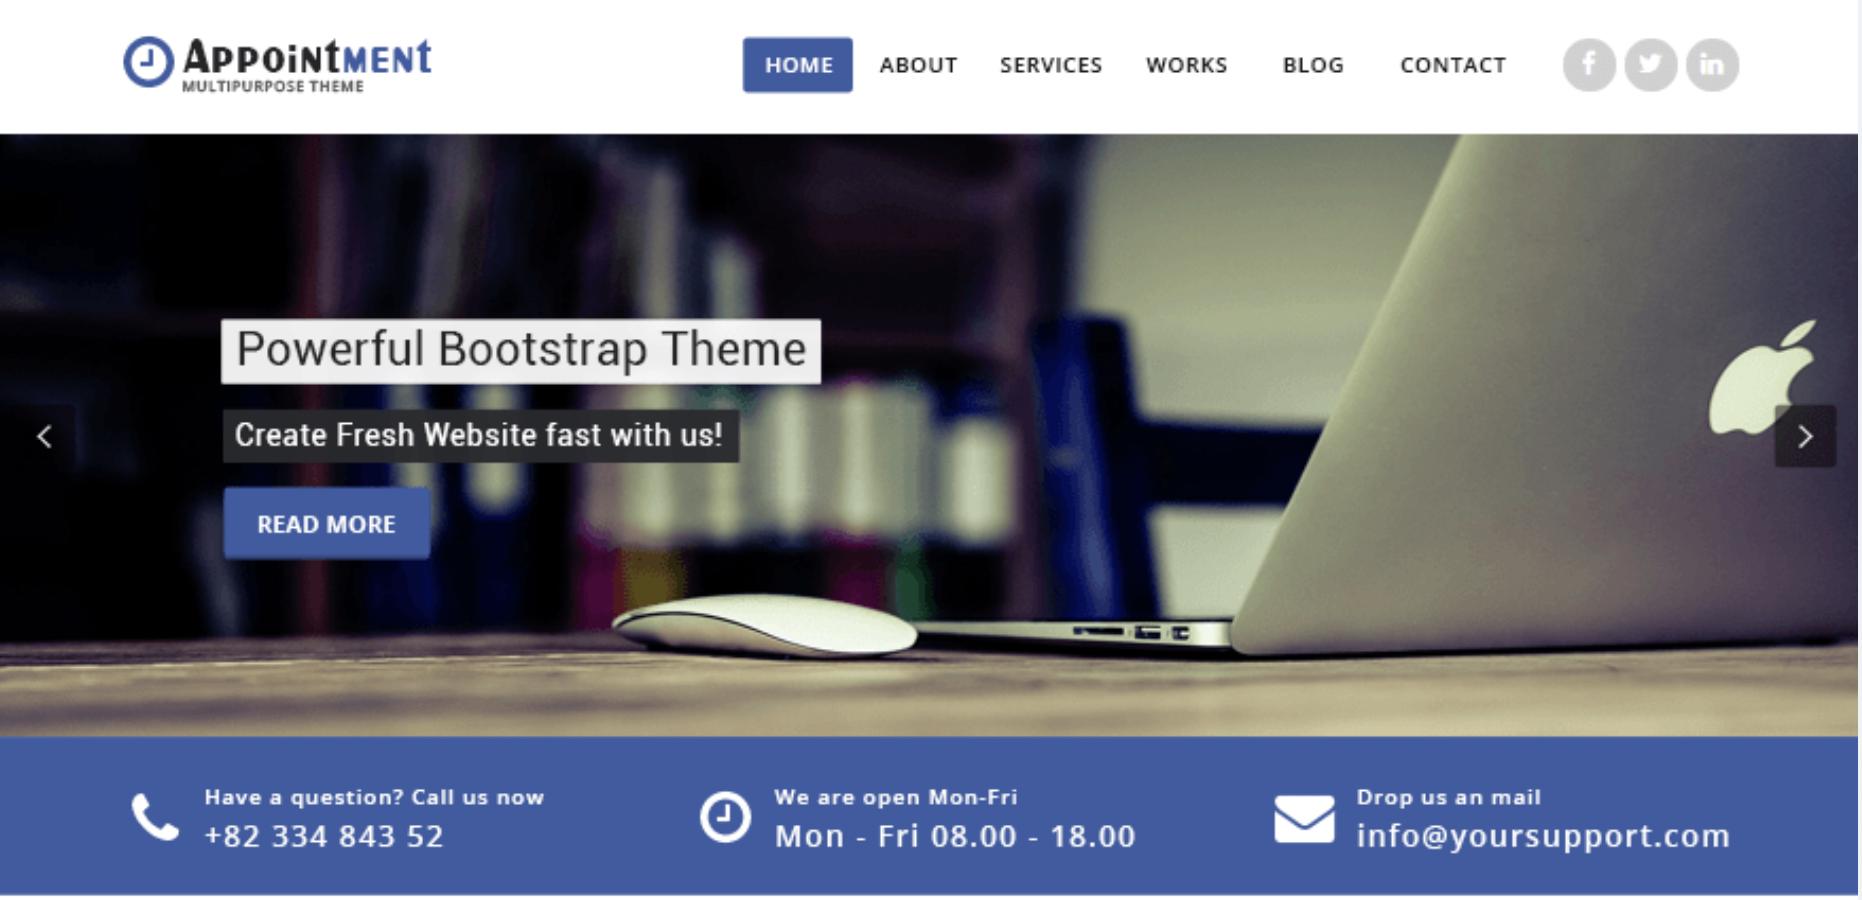 Free Appointment Blue WordPress theme